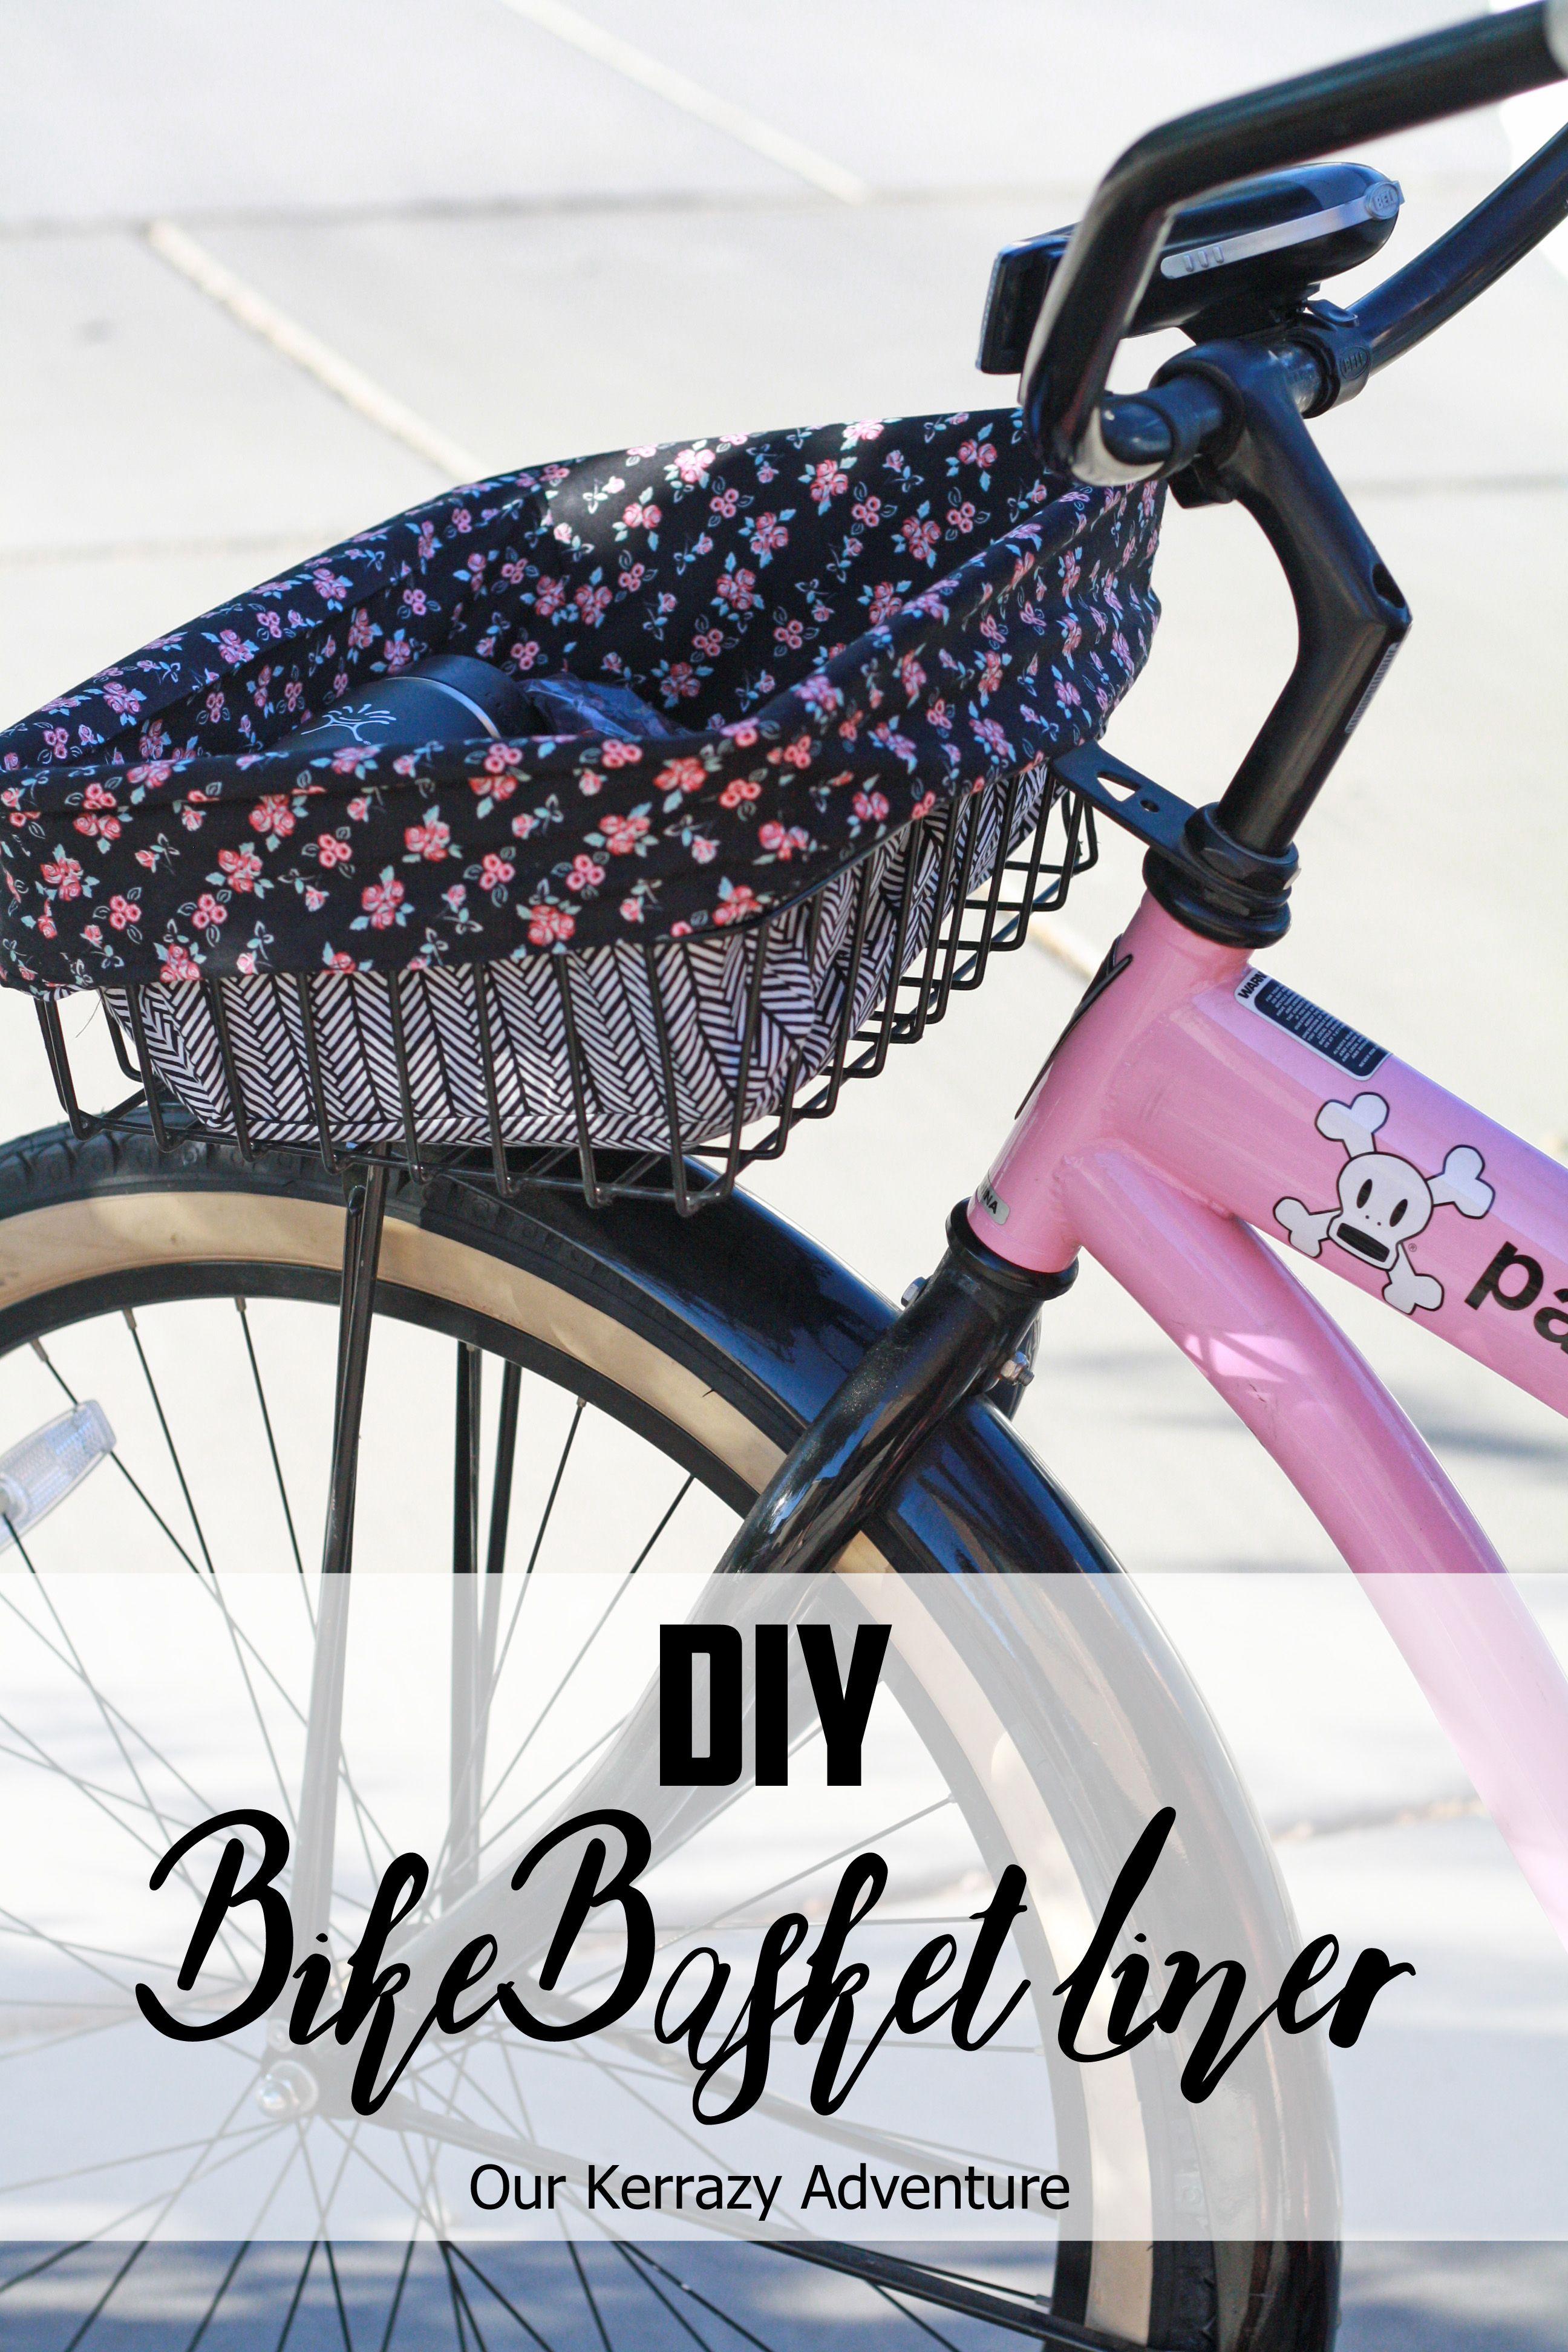 Bike basket liner diy the sewing rabbit.